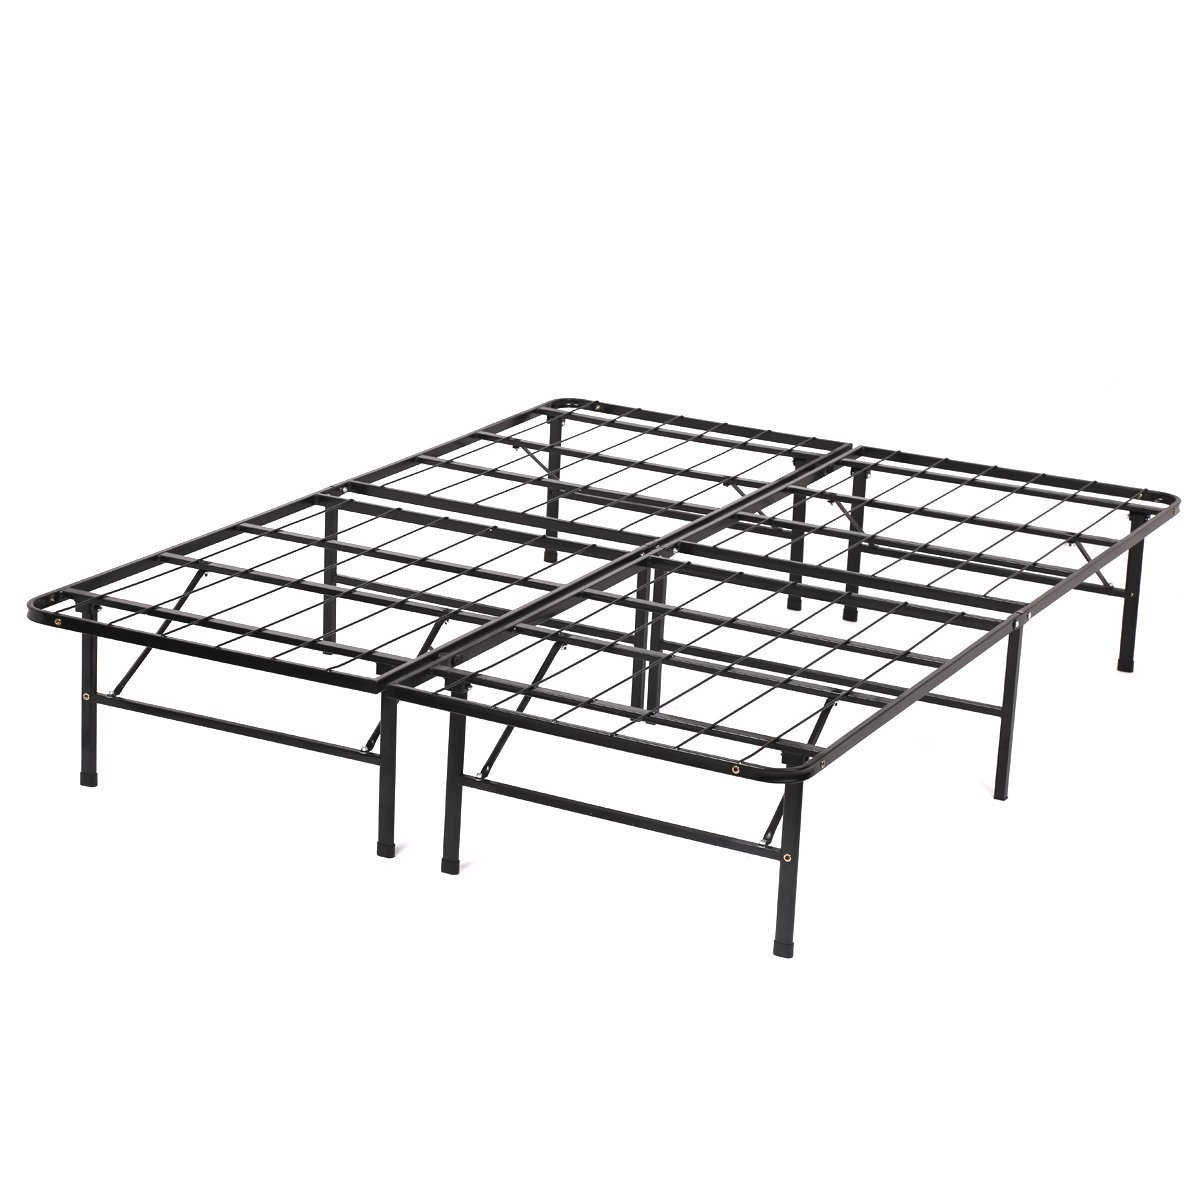 PayLessHere Bed Frame Bi-Fold Full Folding Platform Metal Bed Frame Mattress Foundation